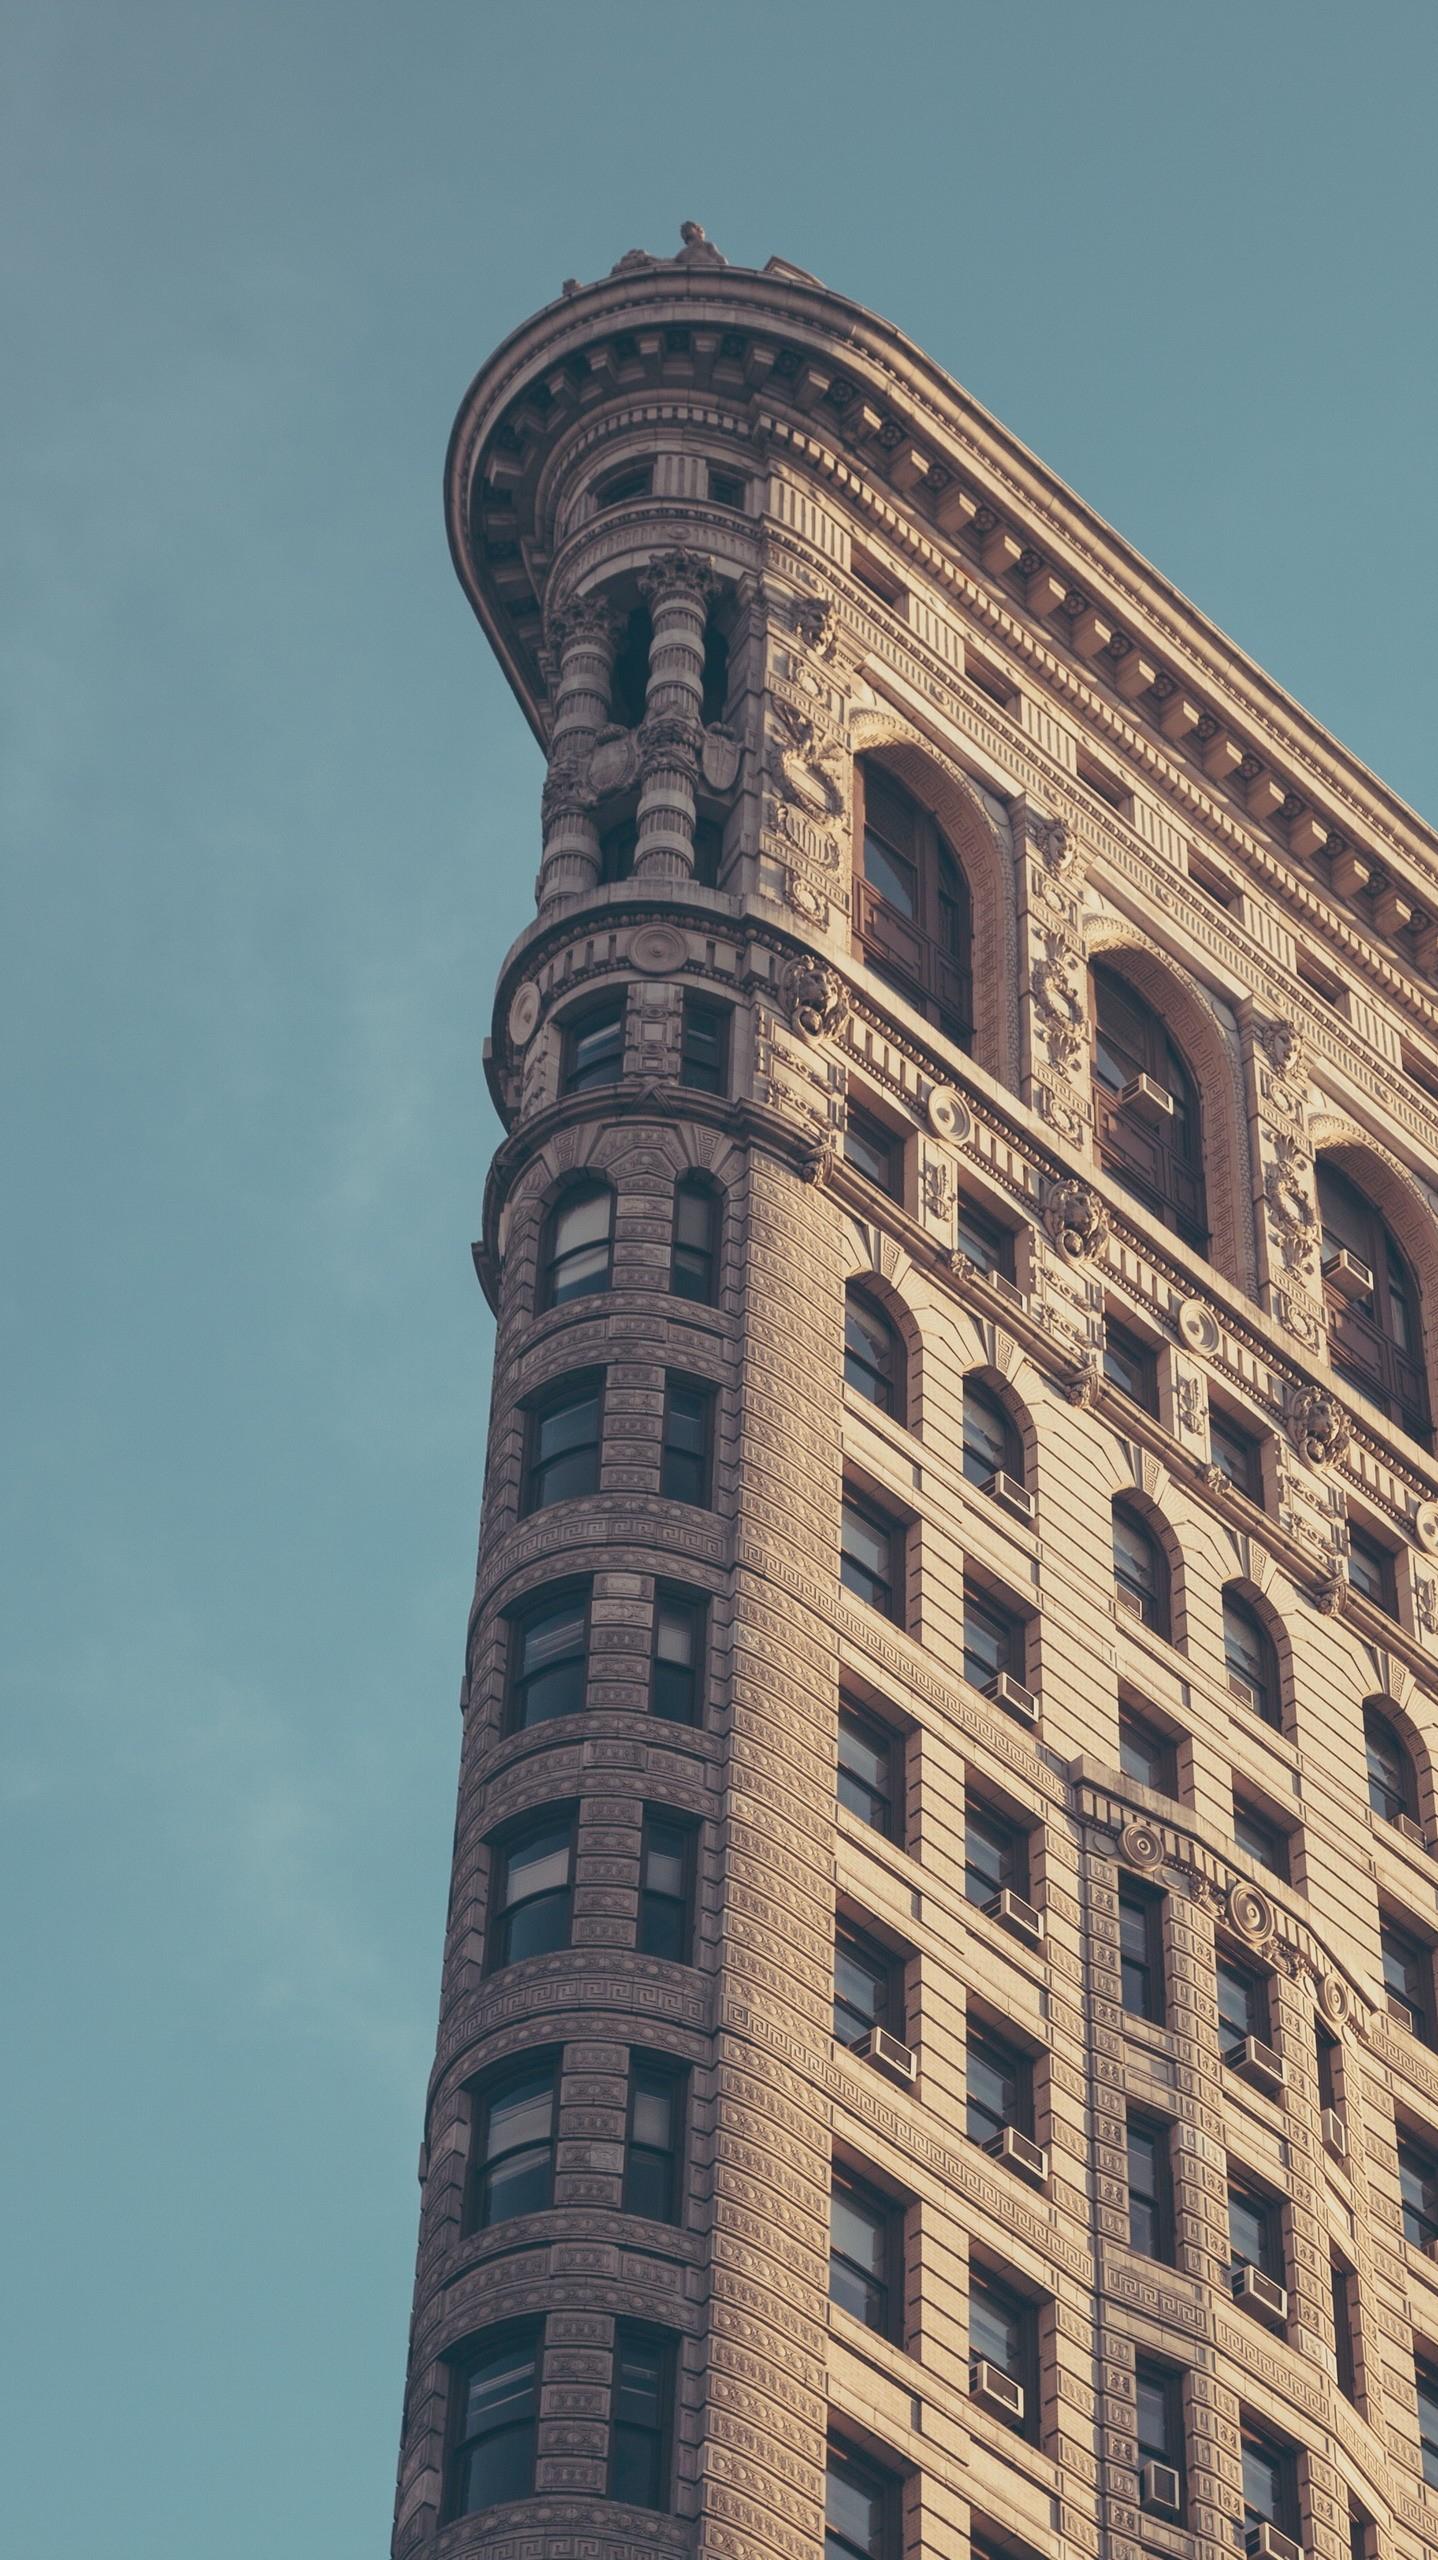 Pinterest Cute Iphone 6 Wallpaper Flatiron Building New York City Minimal Iphone Wallpaper